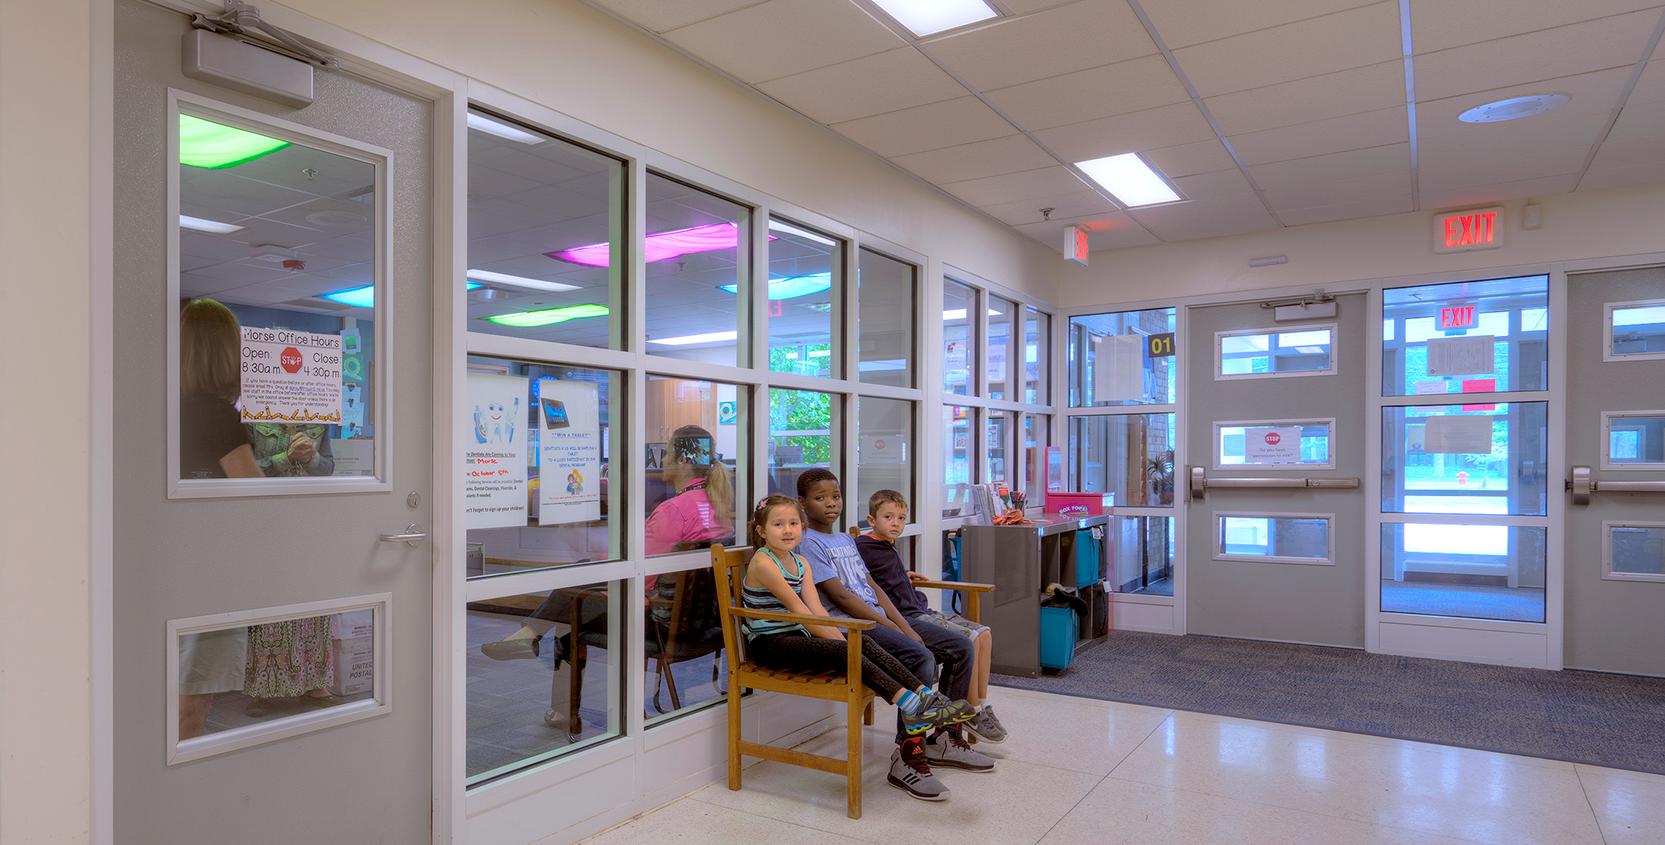 Troy-Public-Schools-School-Entrance_1665x845